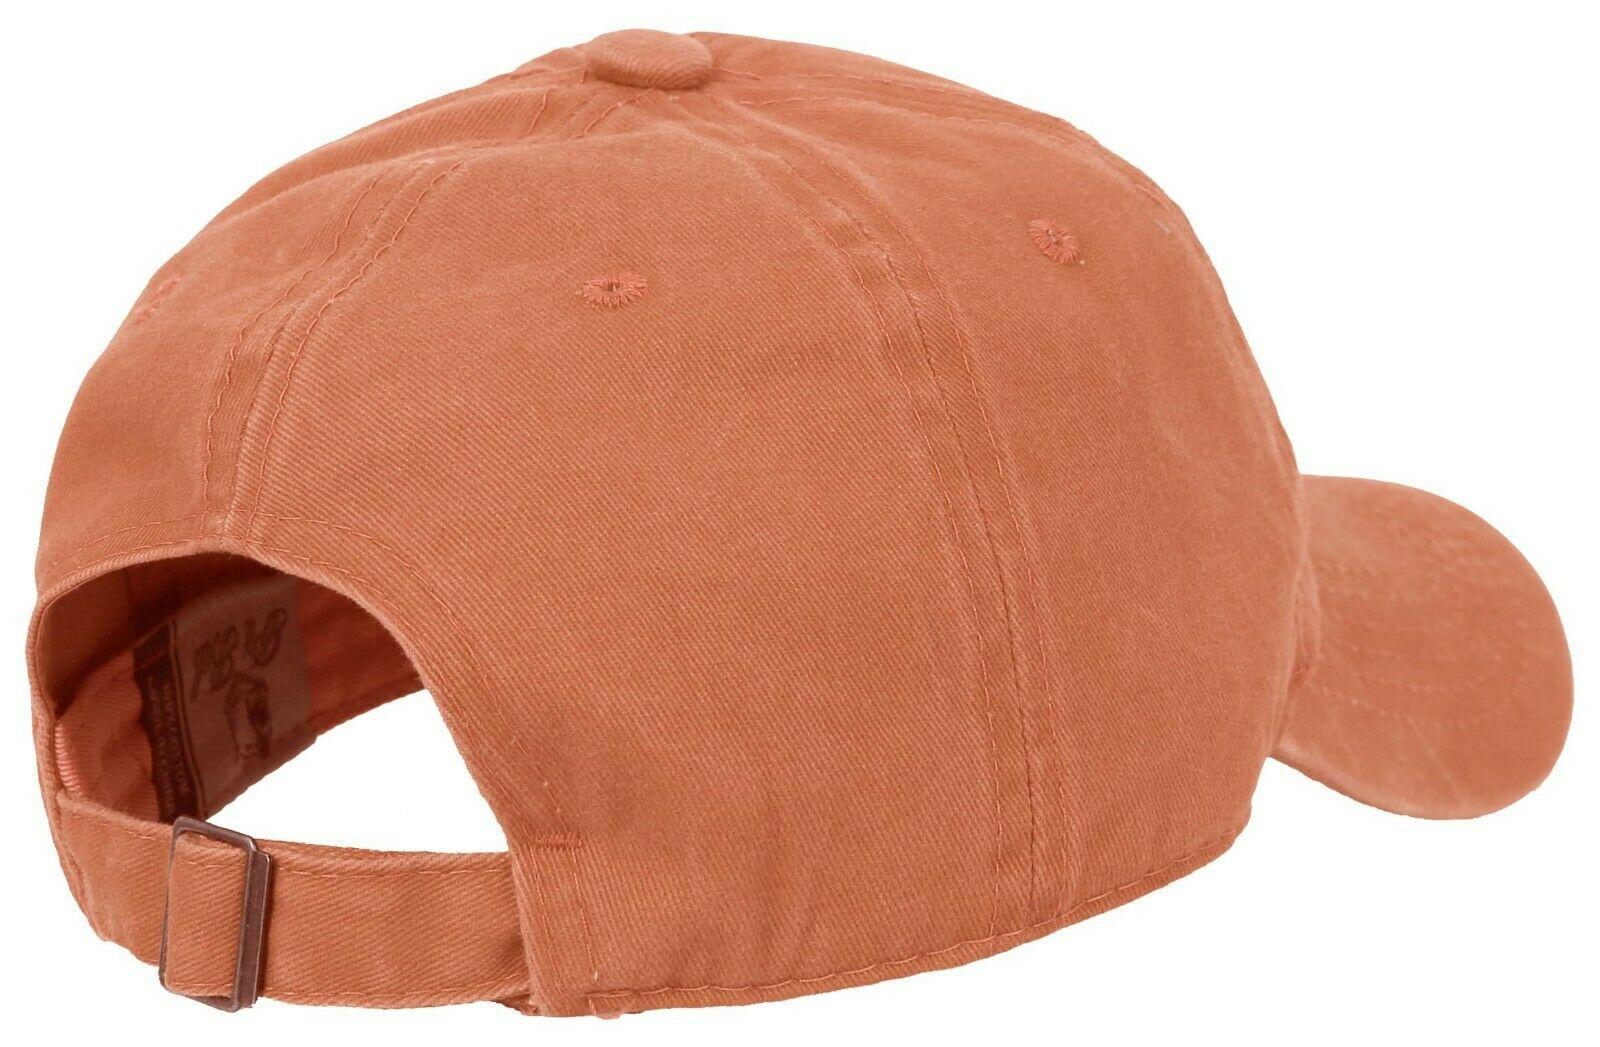 BASEBALL-CAP-Plain-Dad-Hat-Low-Profile-Vintage-Washed-Pigment-Adjustable thumbnail 13